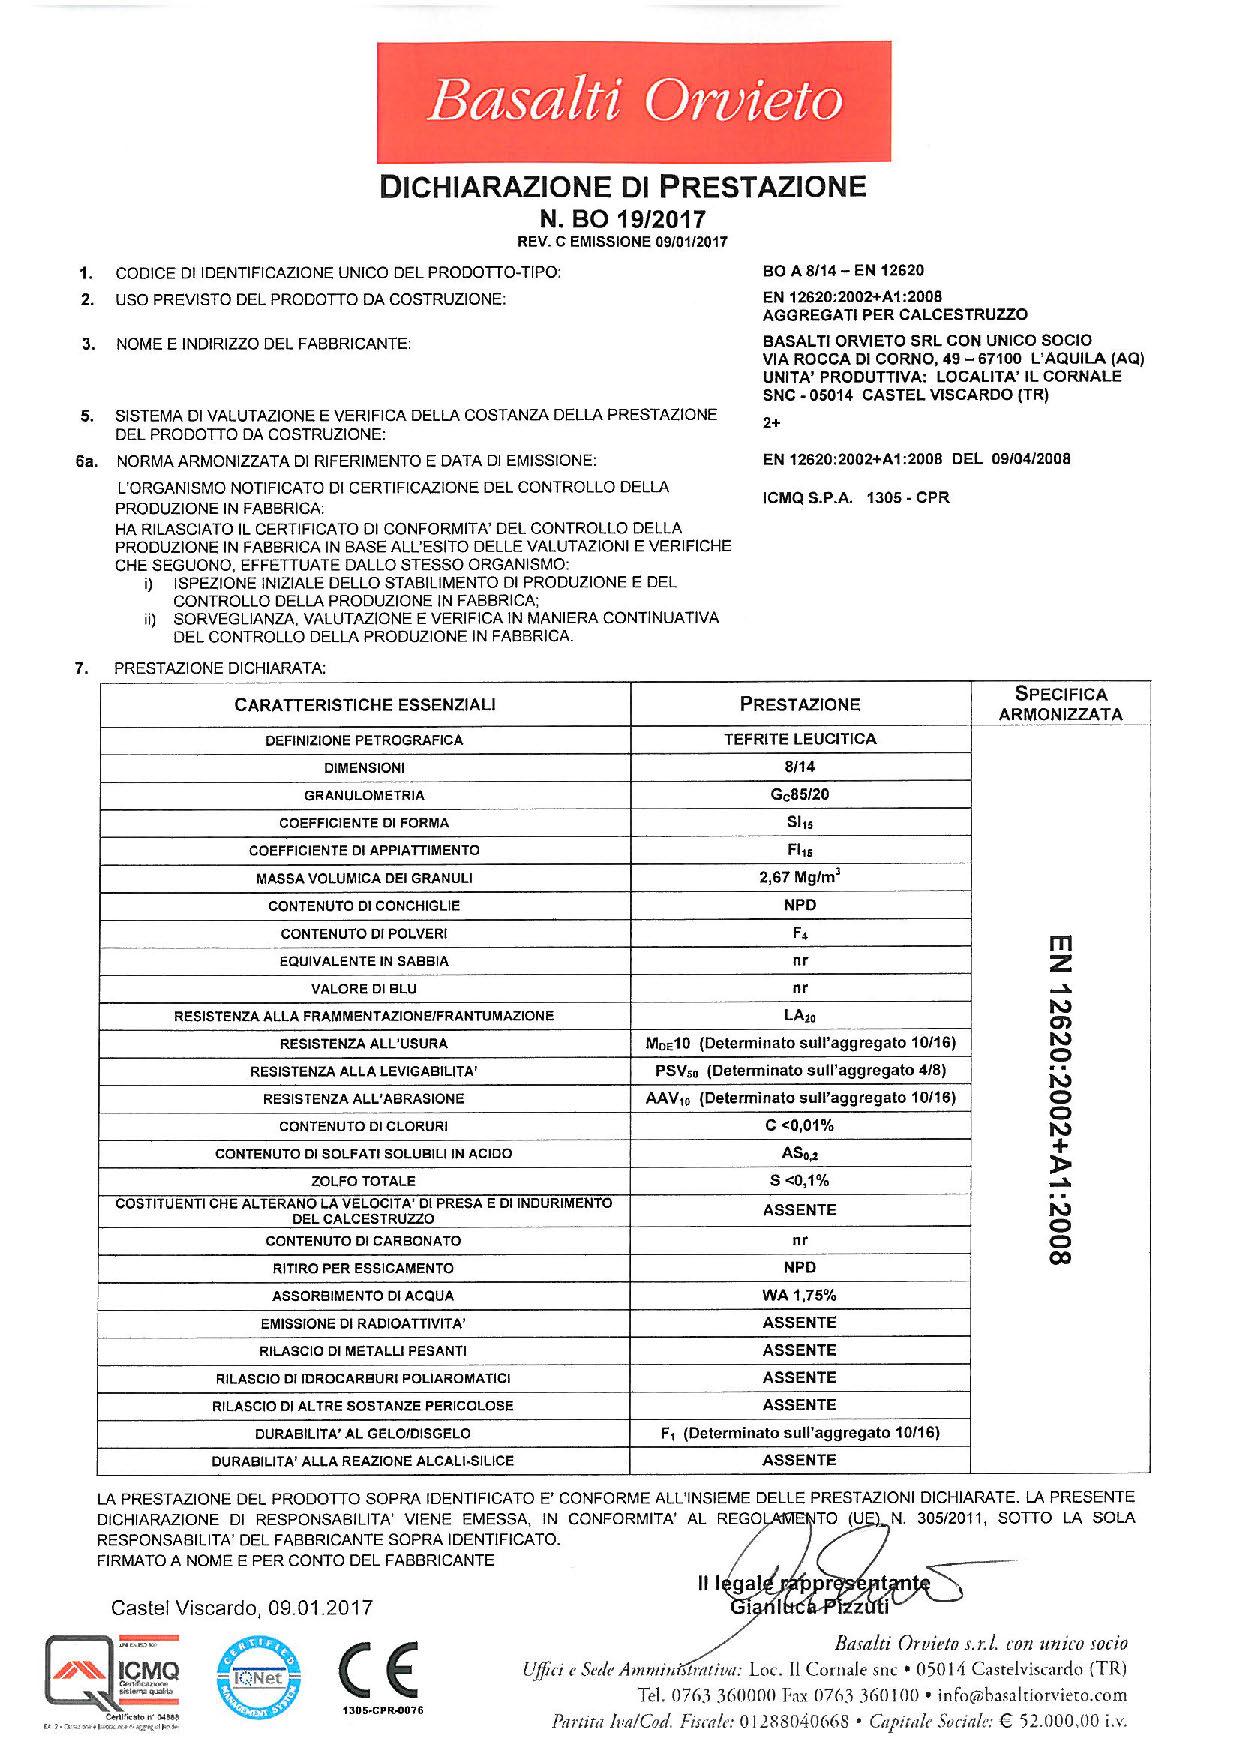 Calcestruzzo_DoP 8-14 - EN 12620